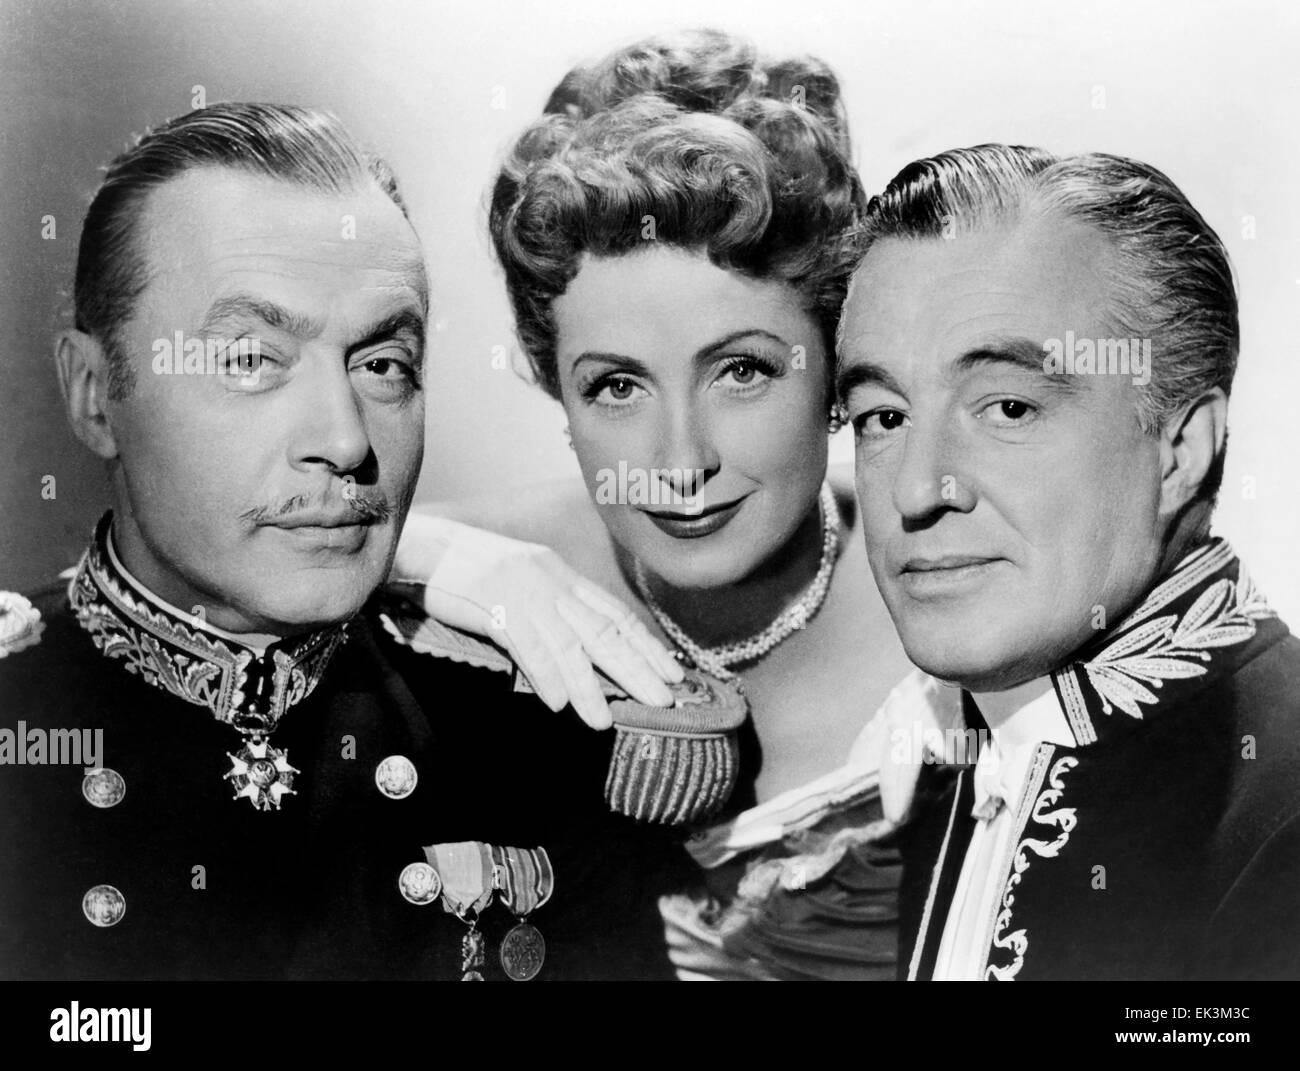 Charles Boyer, Danielle Darrieux, Vittorio De Sica, Onset Of The Film